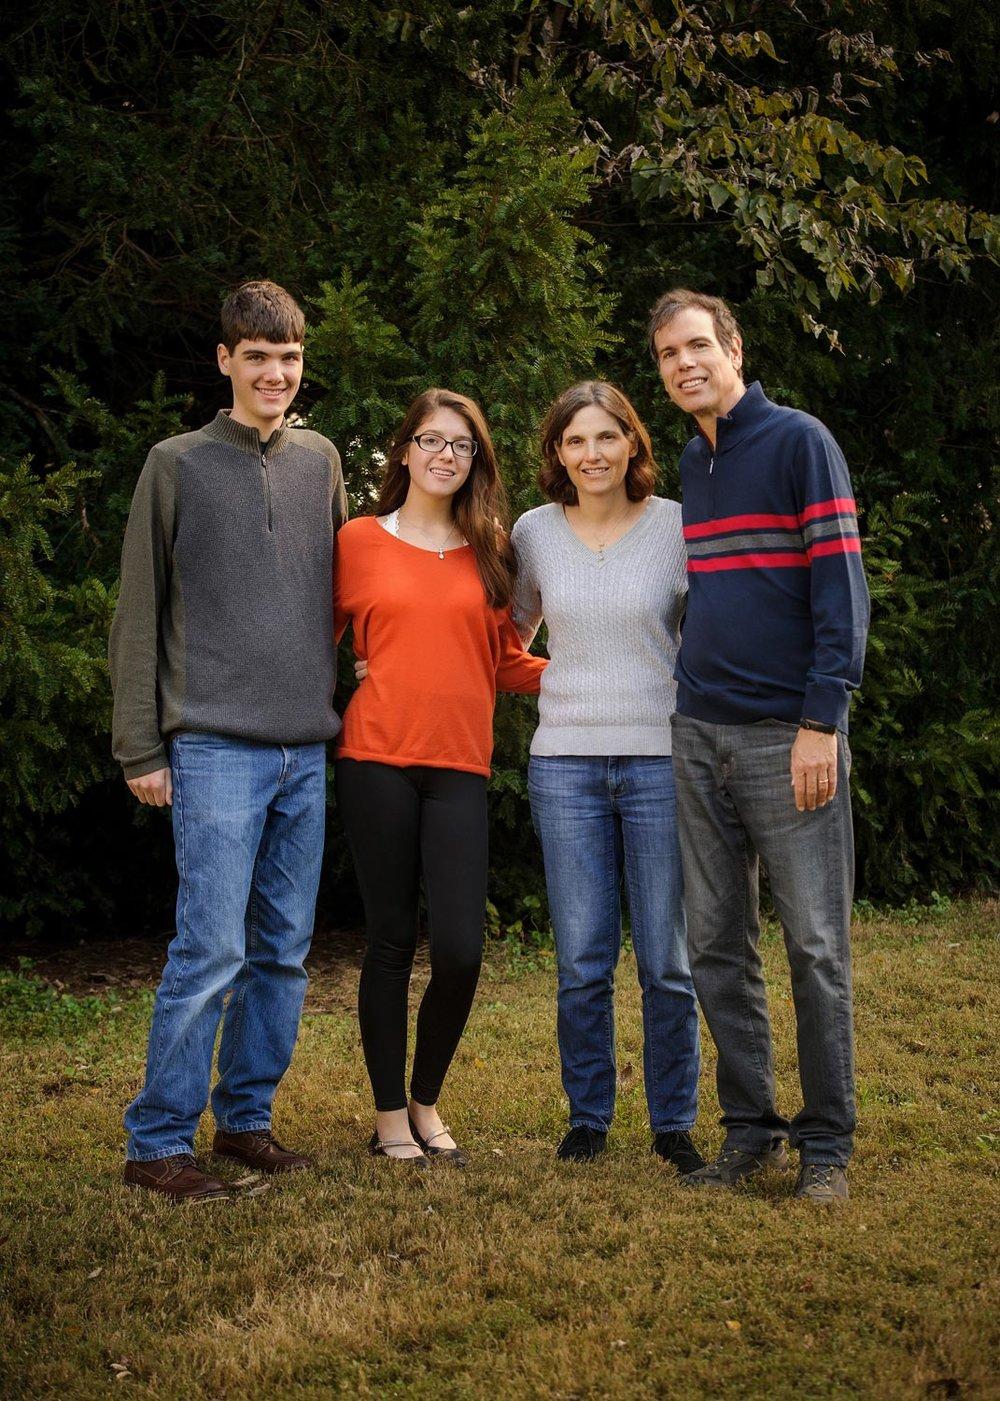 family-photography-Lexington-ky-studio-walz023.jpg